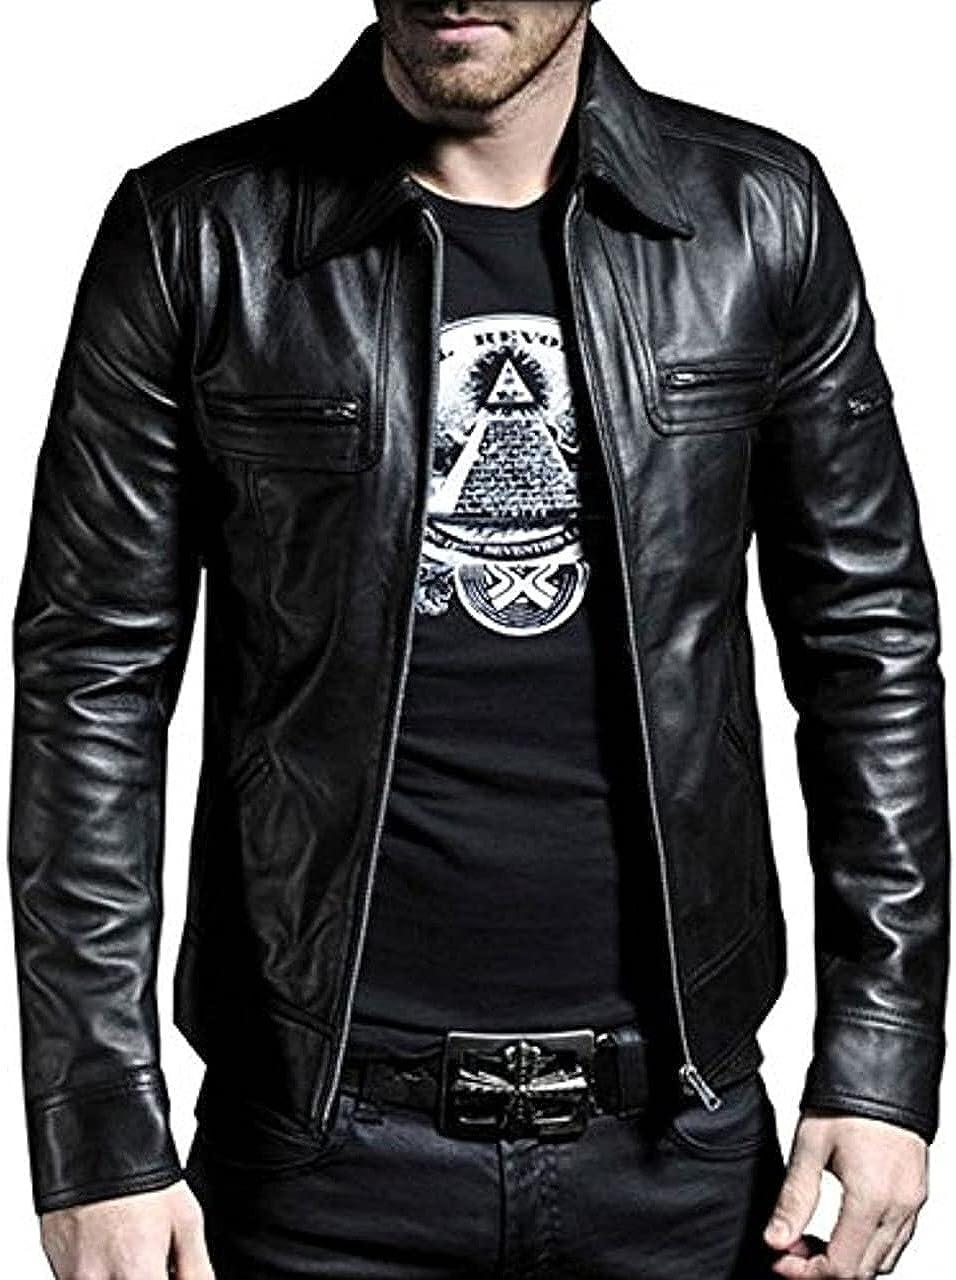 TCJ Men's Genuine Leather Jacket, Black Stylish, Lamb-skin Biker Leather Jacket